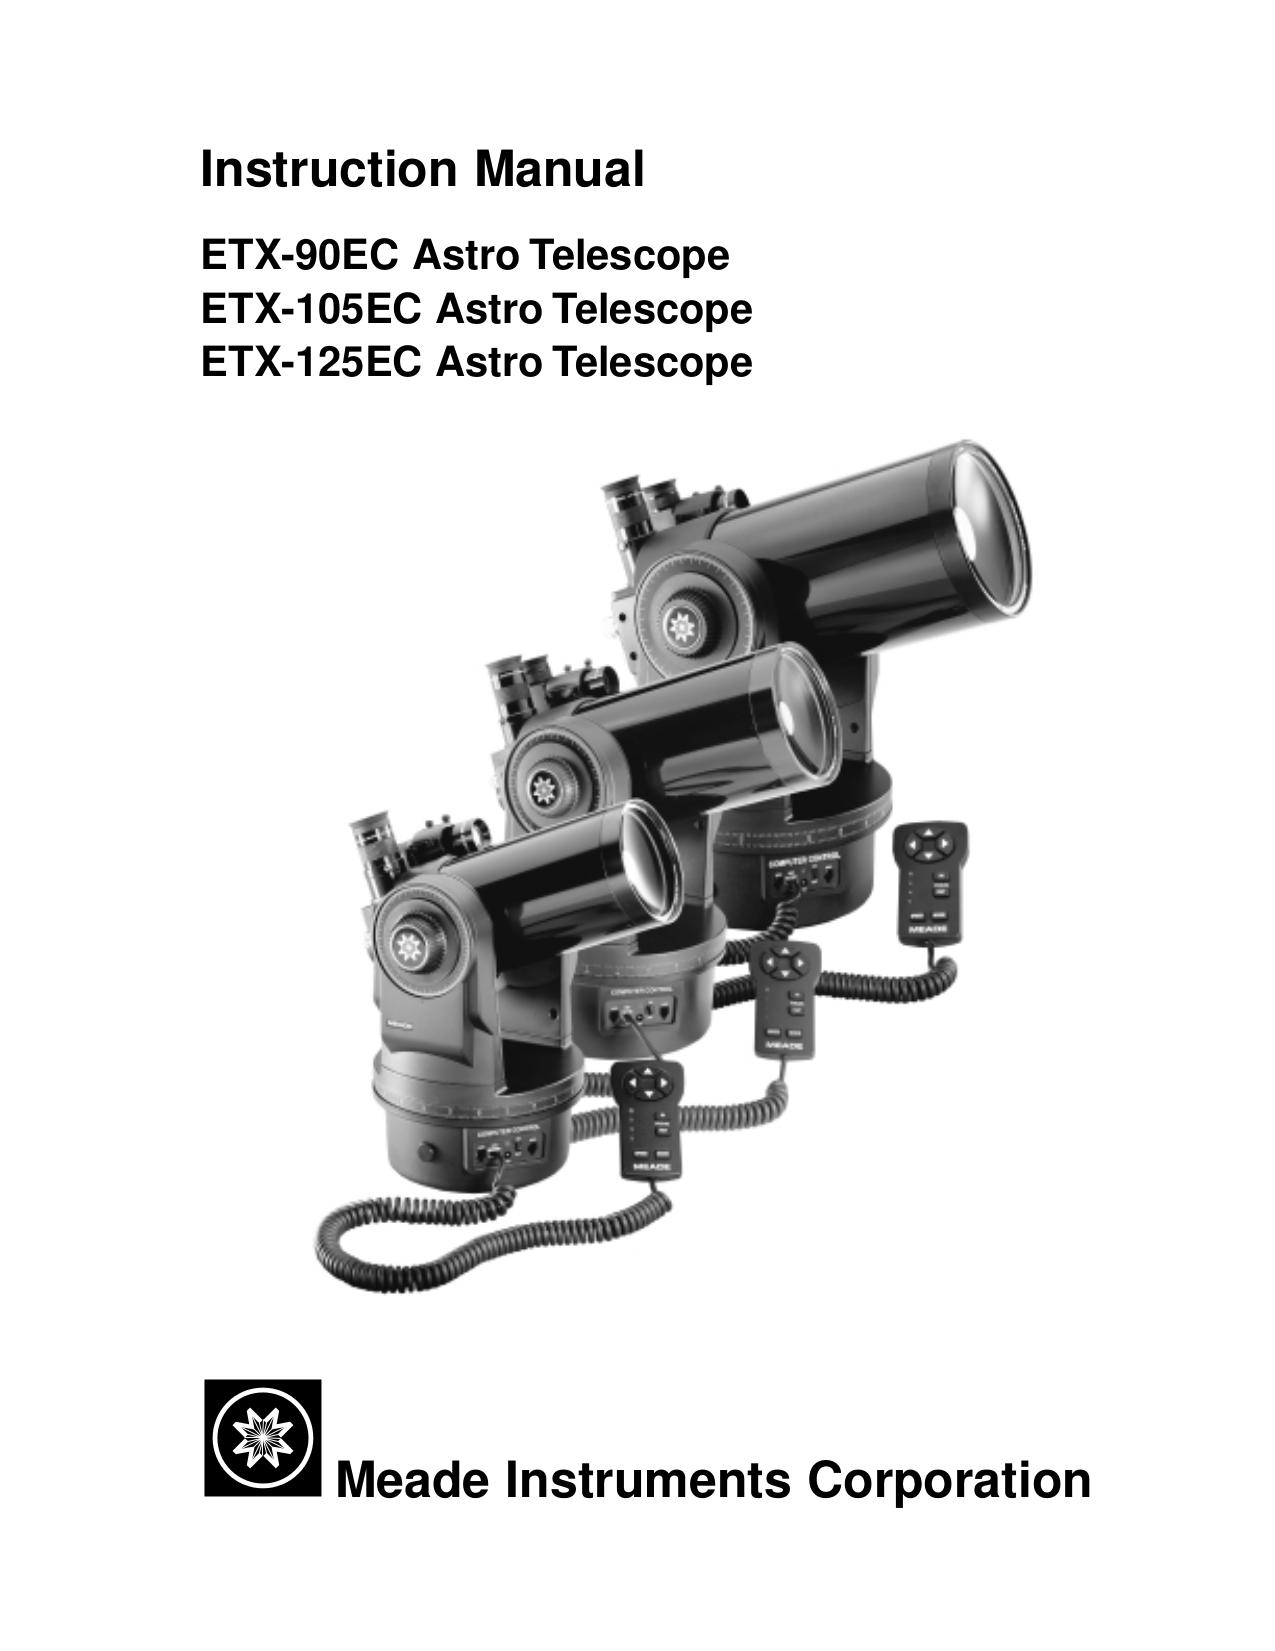 Meade etx-90 observer 90mm f/13. 8 maksutov-cassegrain.